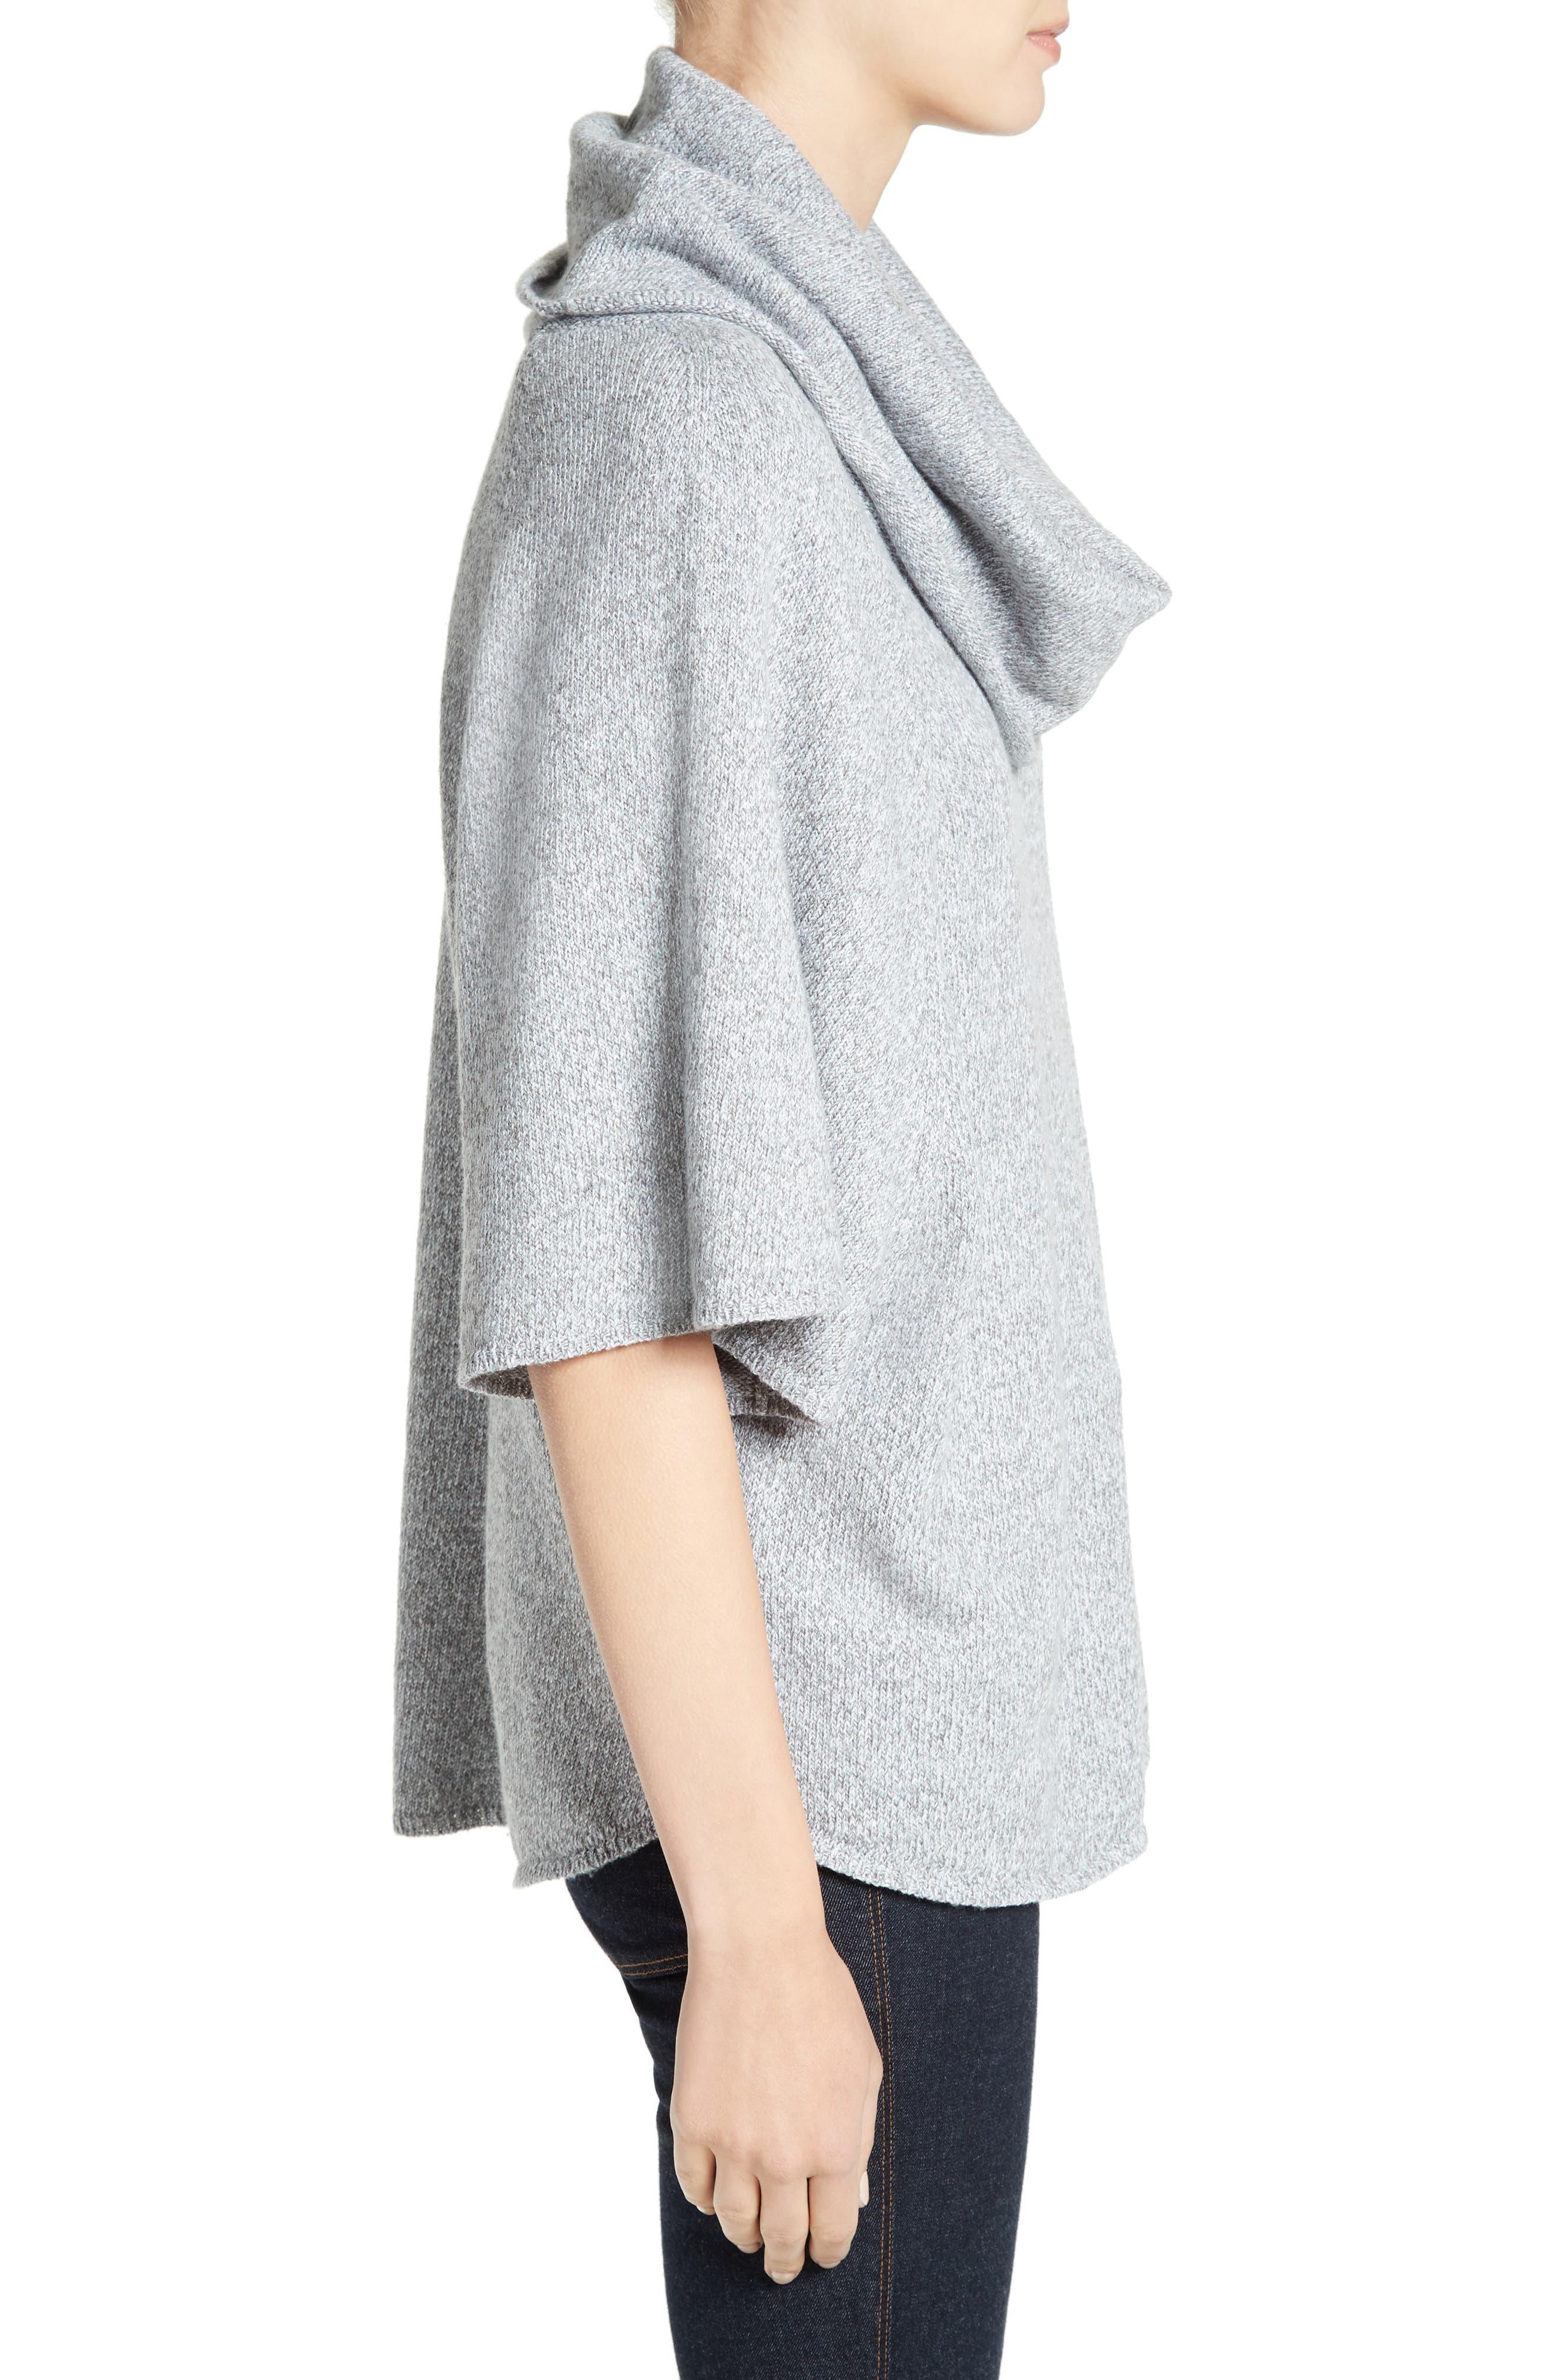 Celia Cowl Neck Sweater,                             Alternate thumbnail 3, color,